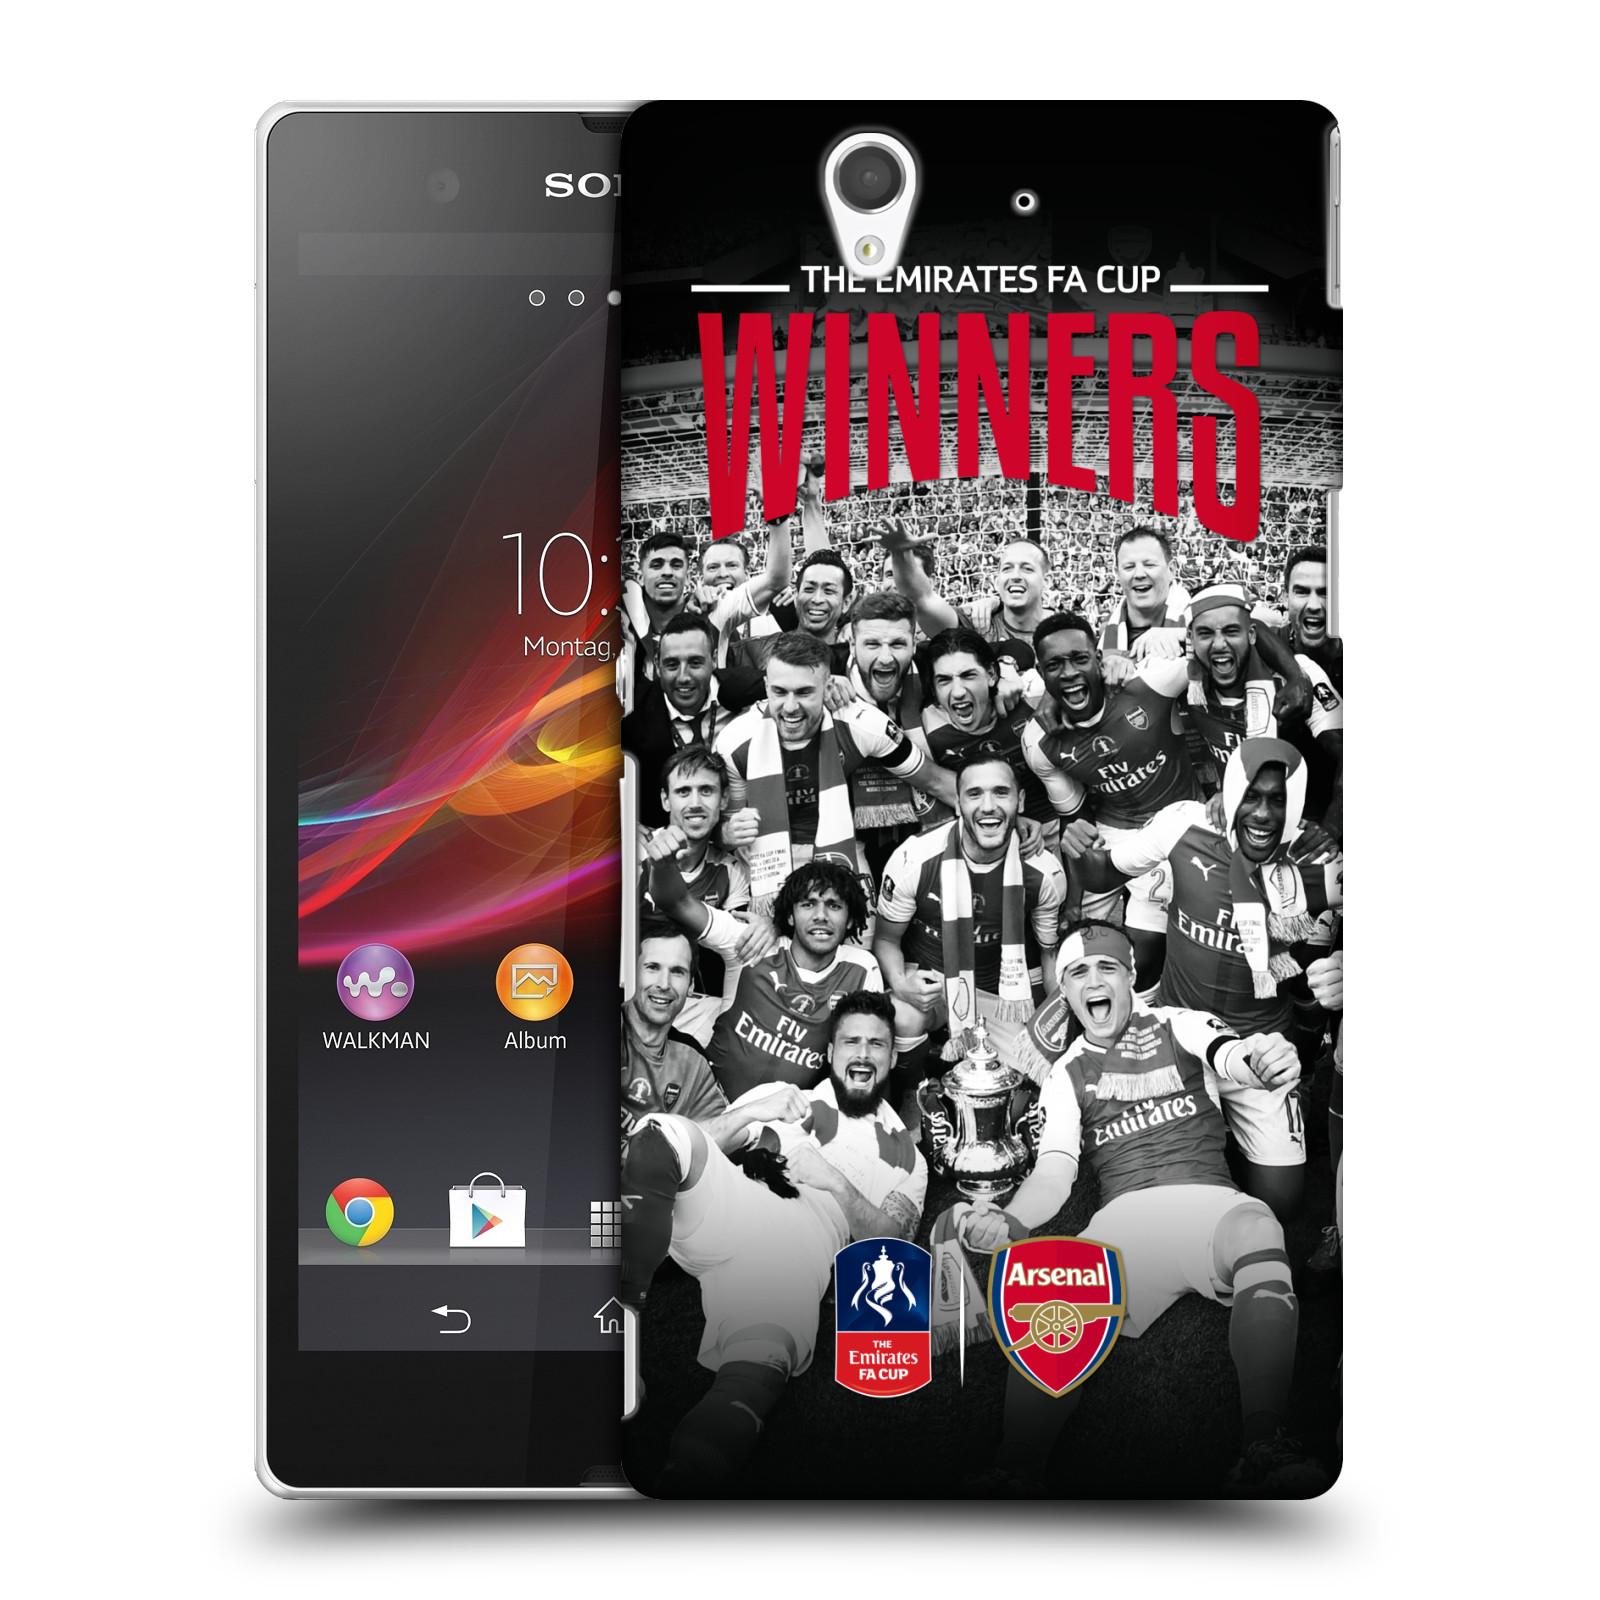 Plastové pouzdro na mobil Sony Xperia Z C6603 - Head Case - Arsenal FC - Celebration